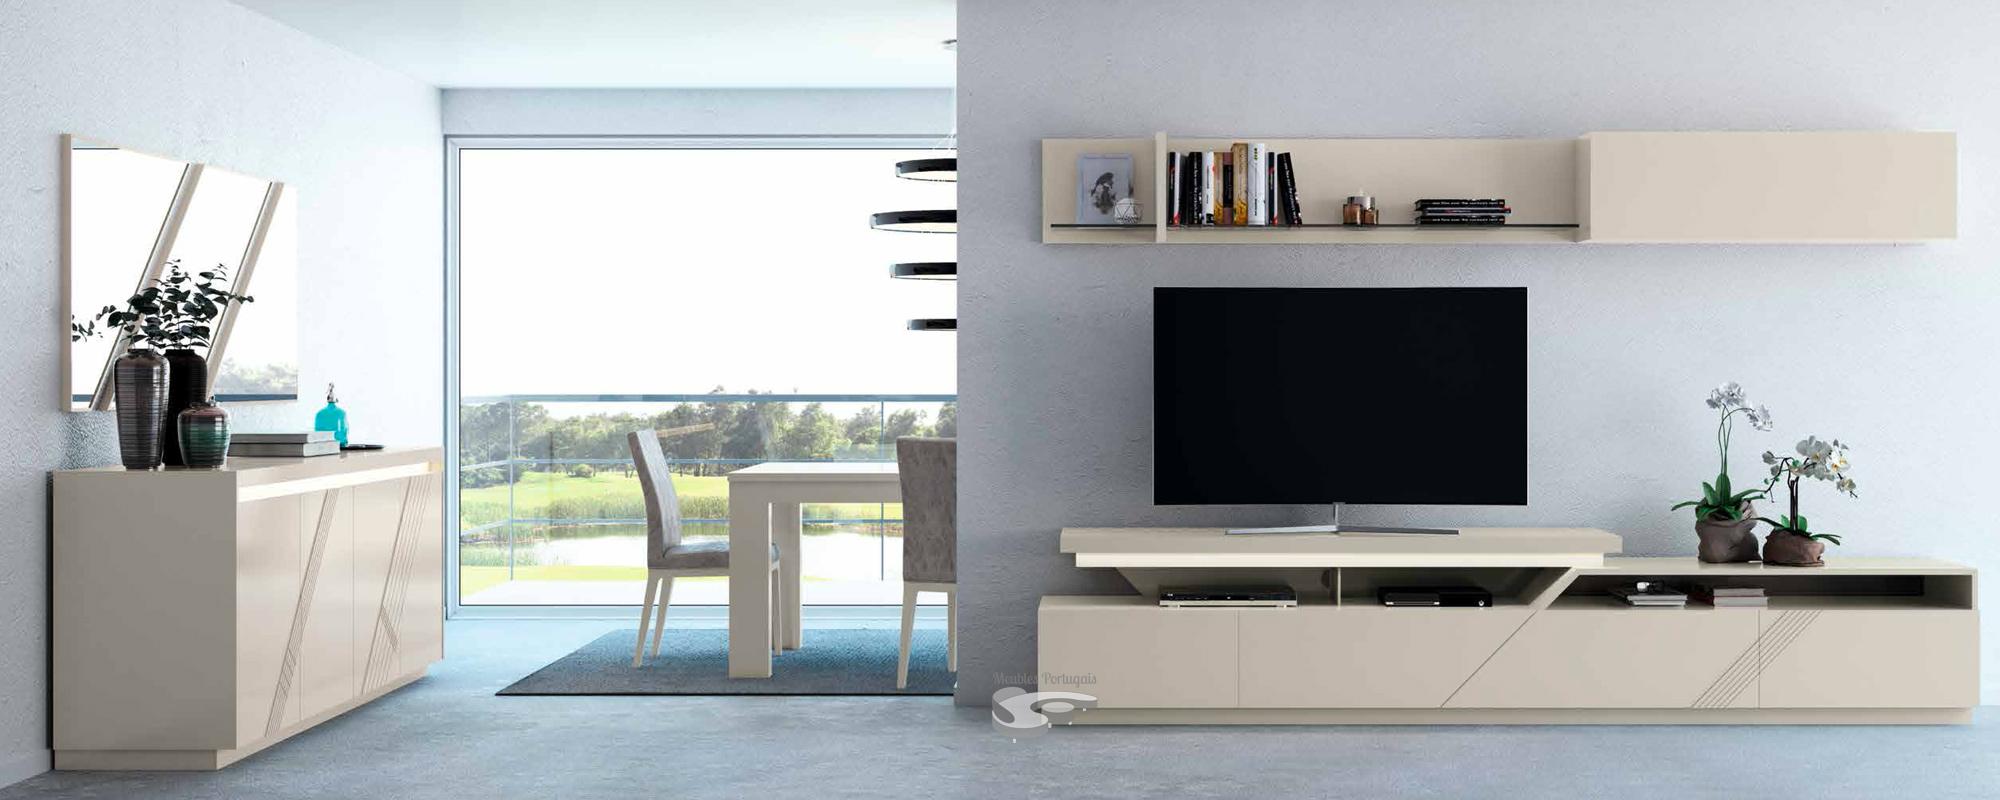 fabricant meuble portugais meuble portugal meuble portugal swipe with fabricant meuble. Black Bedroom Furniture Sets. Home Design Ideas